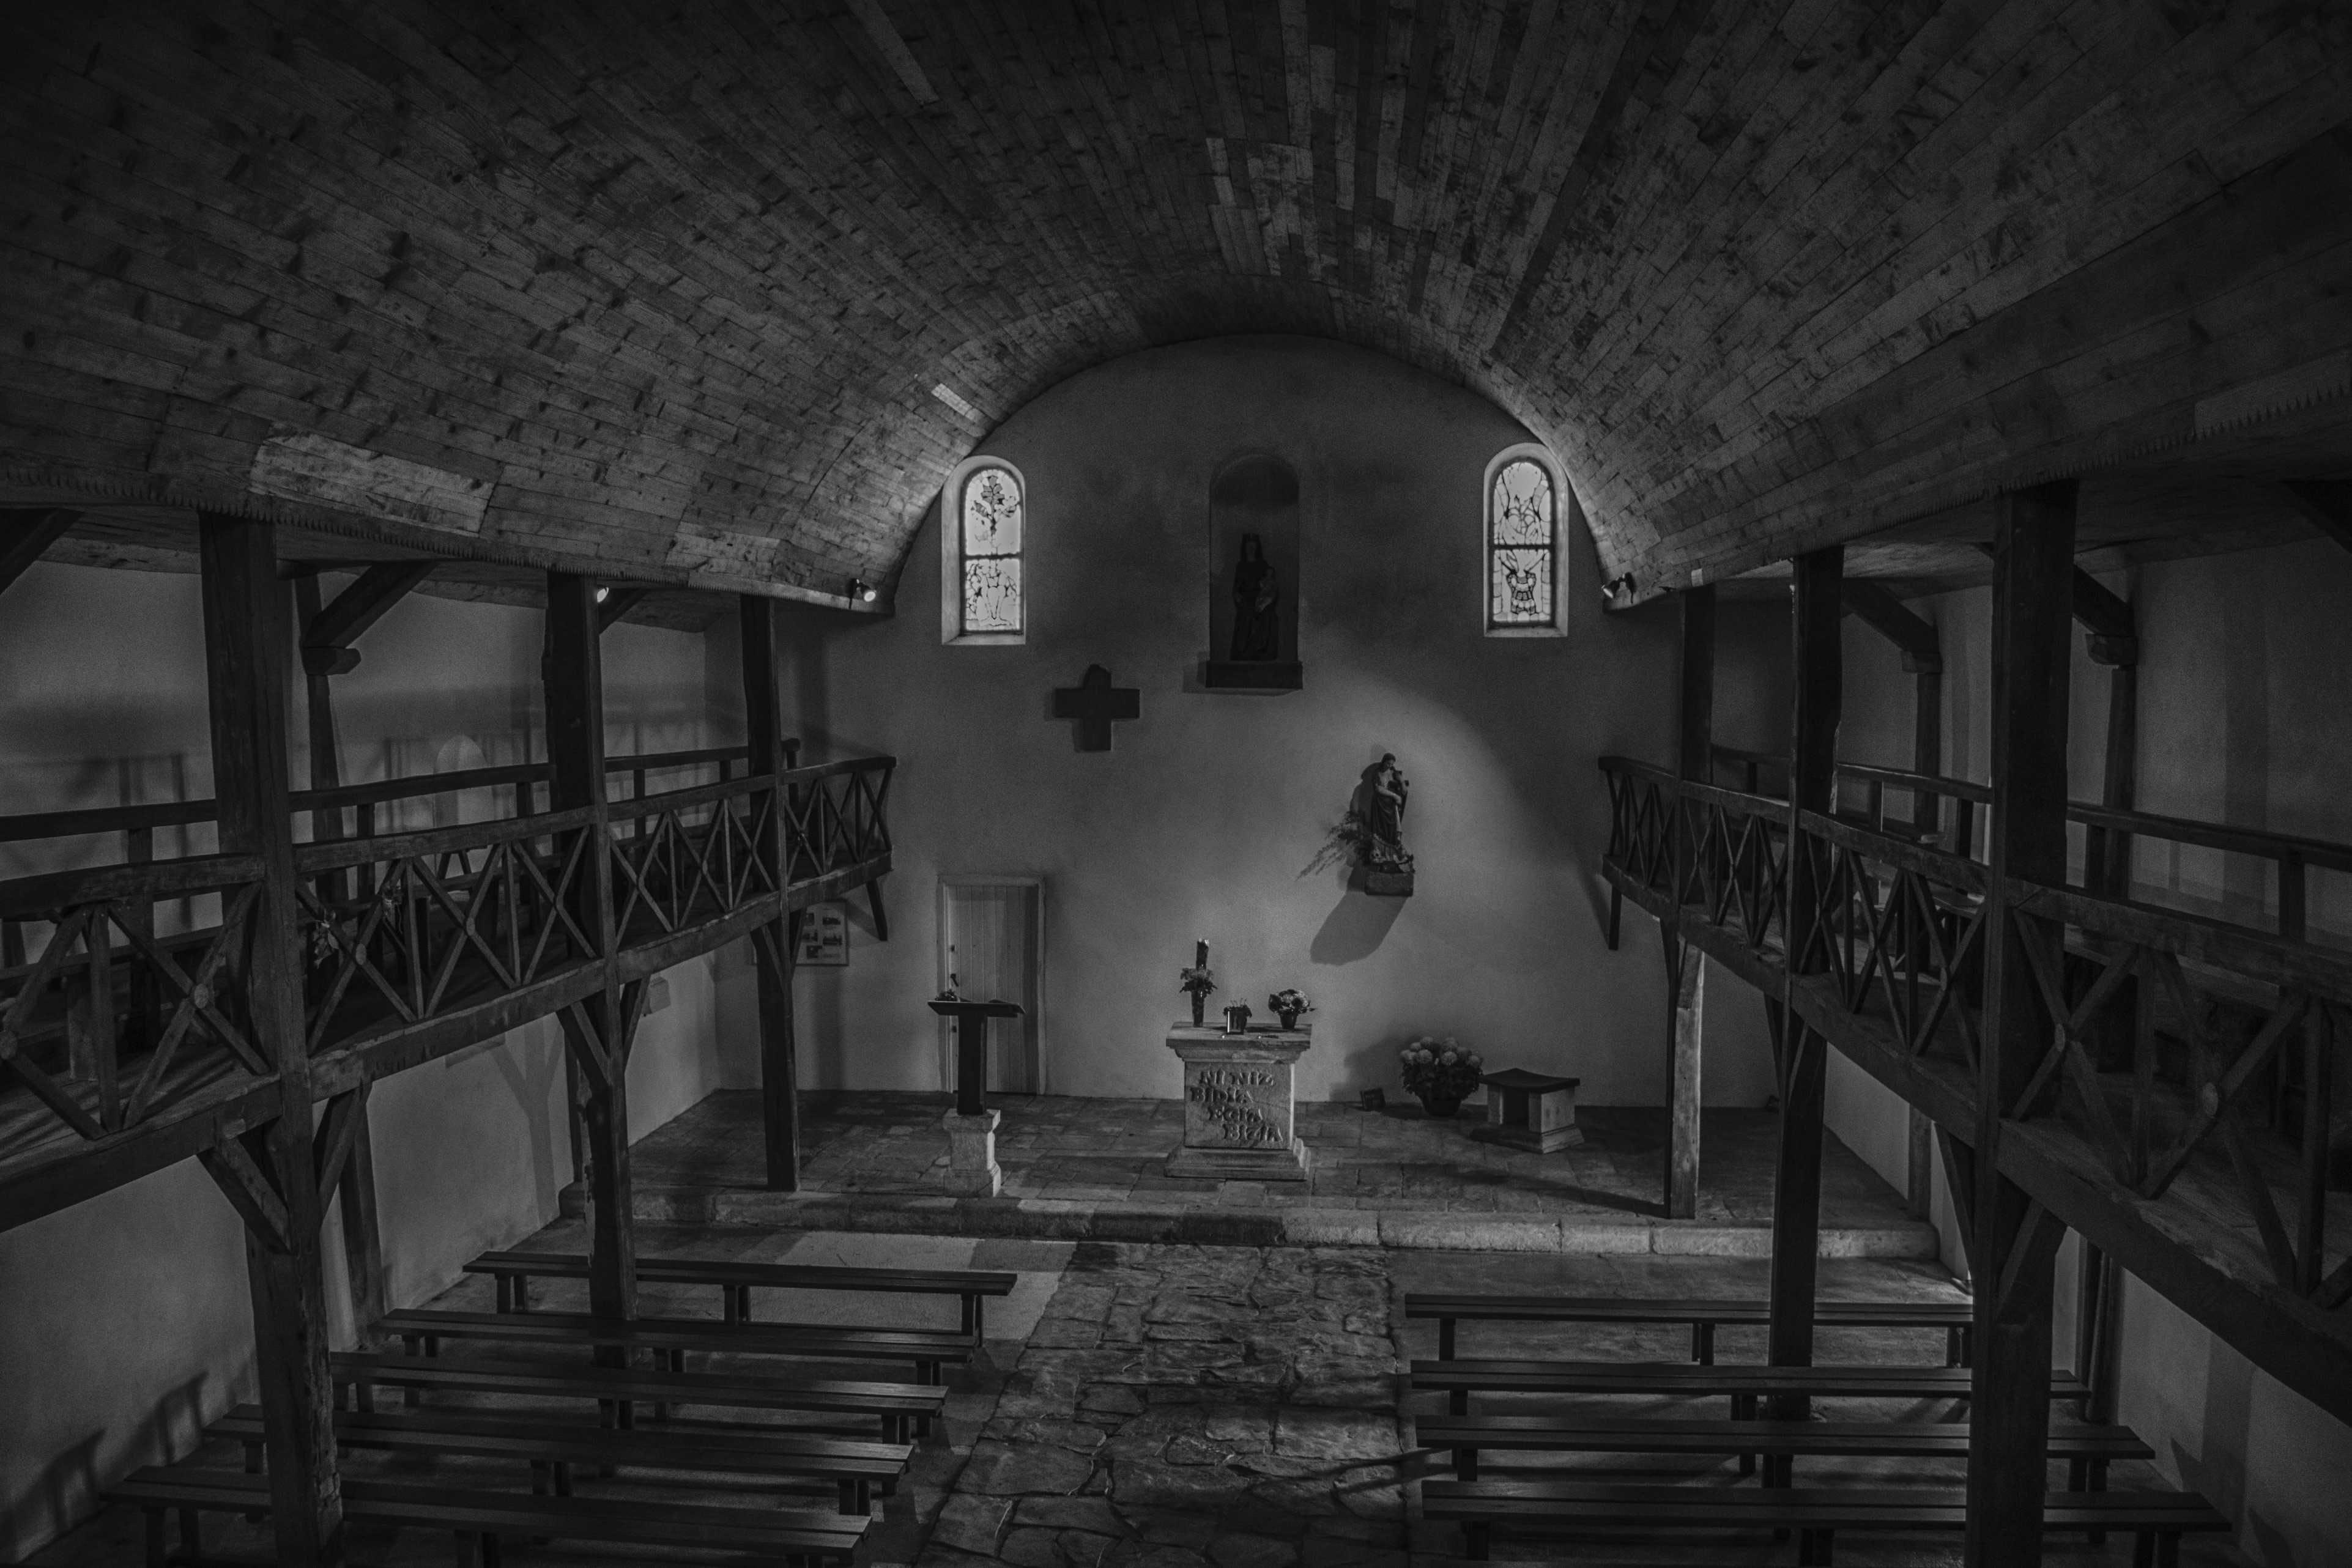 Free stock photo of Chapelle de la Madeleine-Tardets (64)